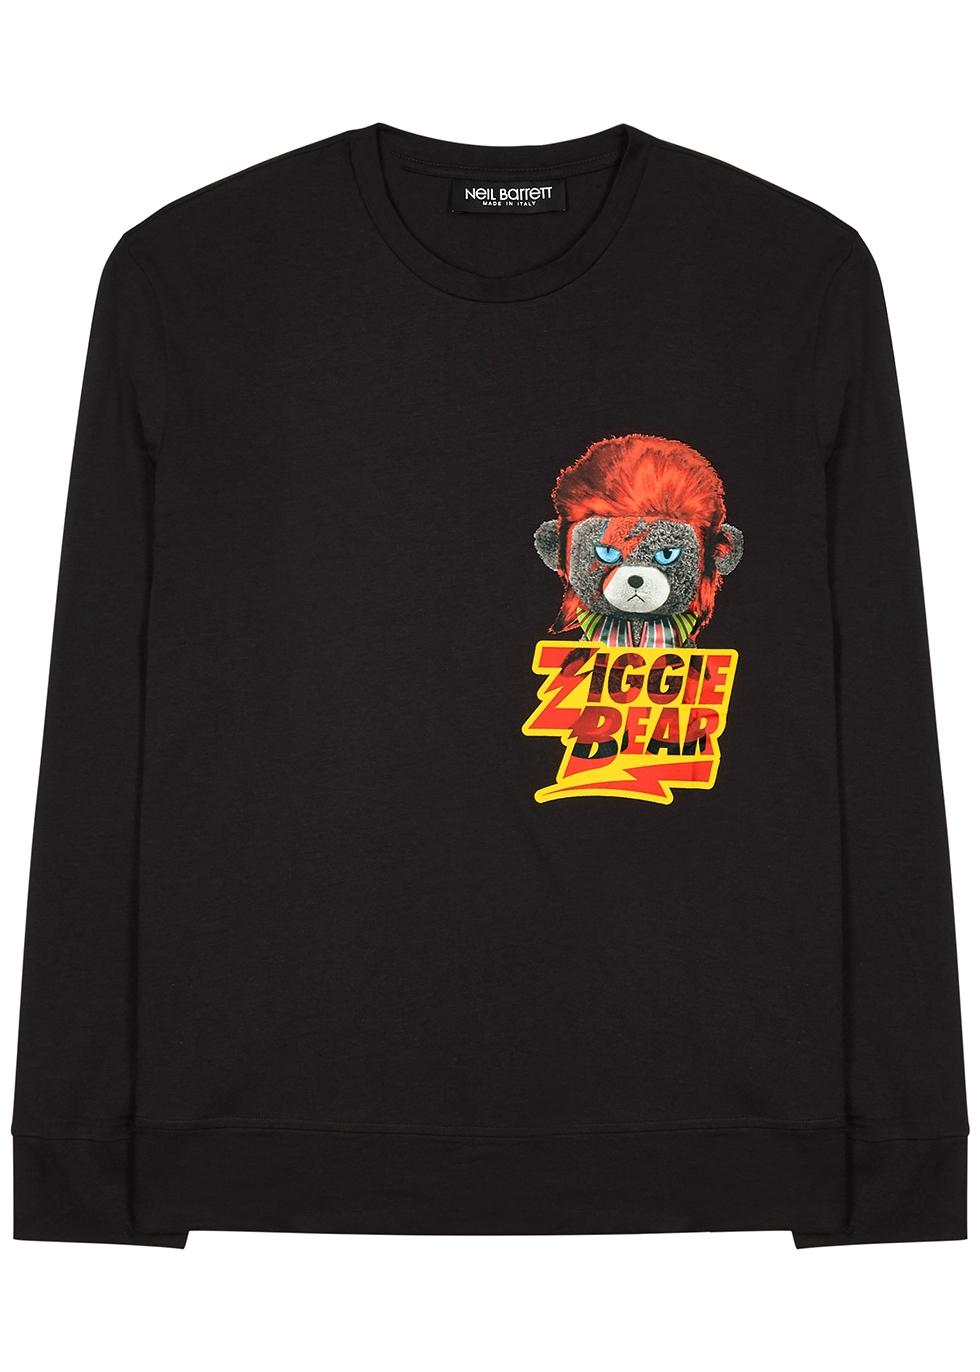 Ziggie Bear printed jersey top